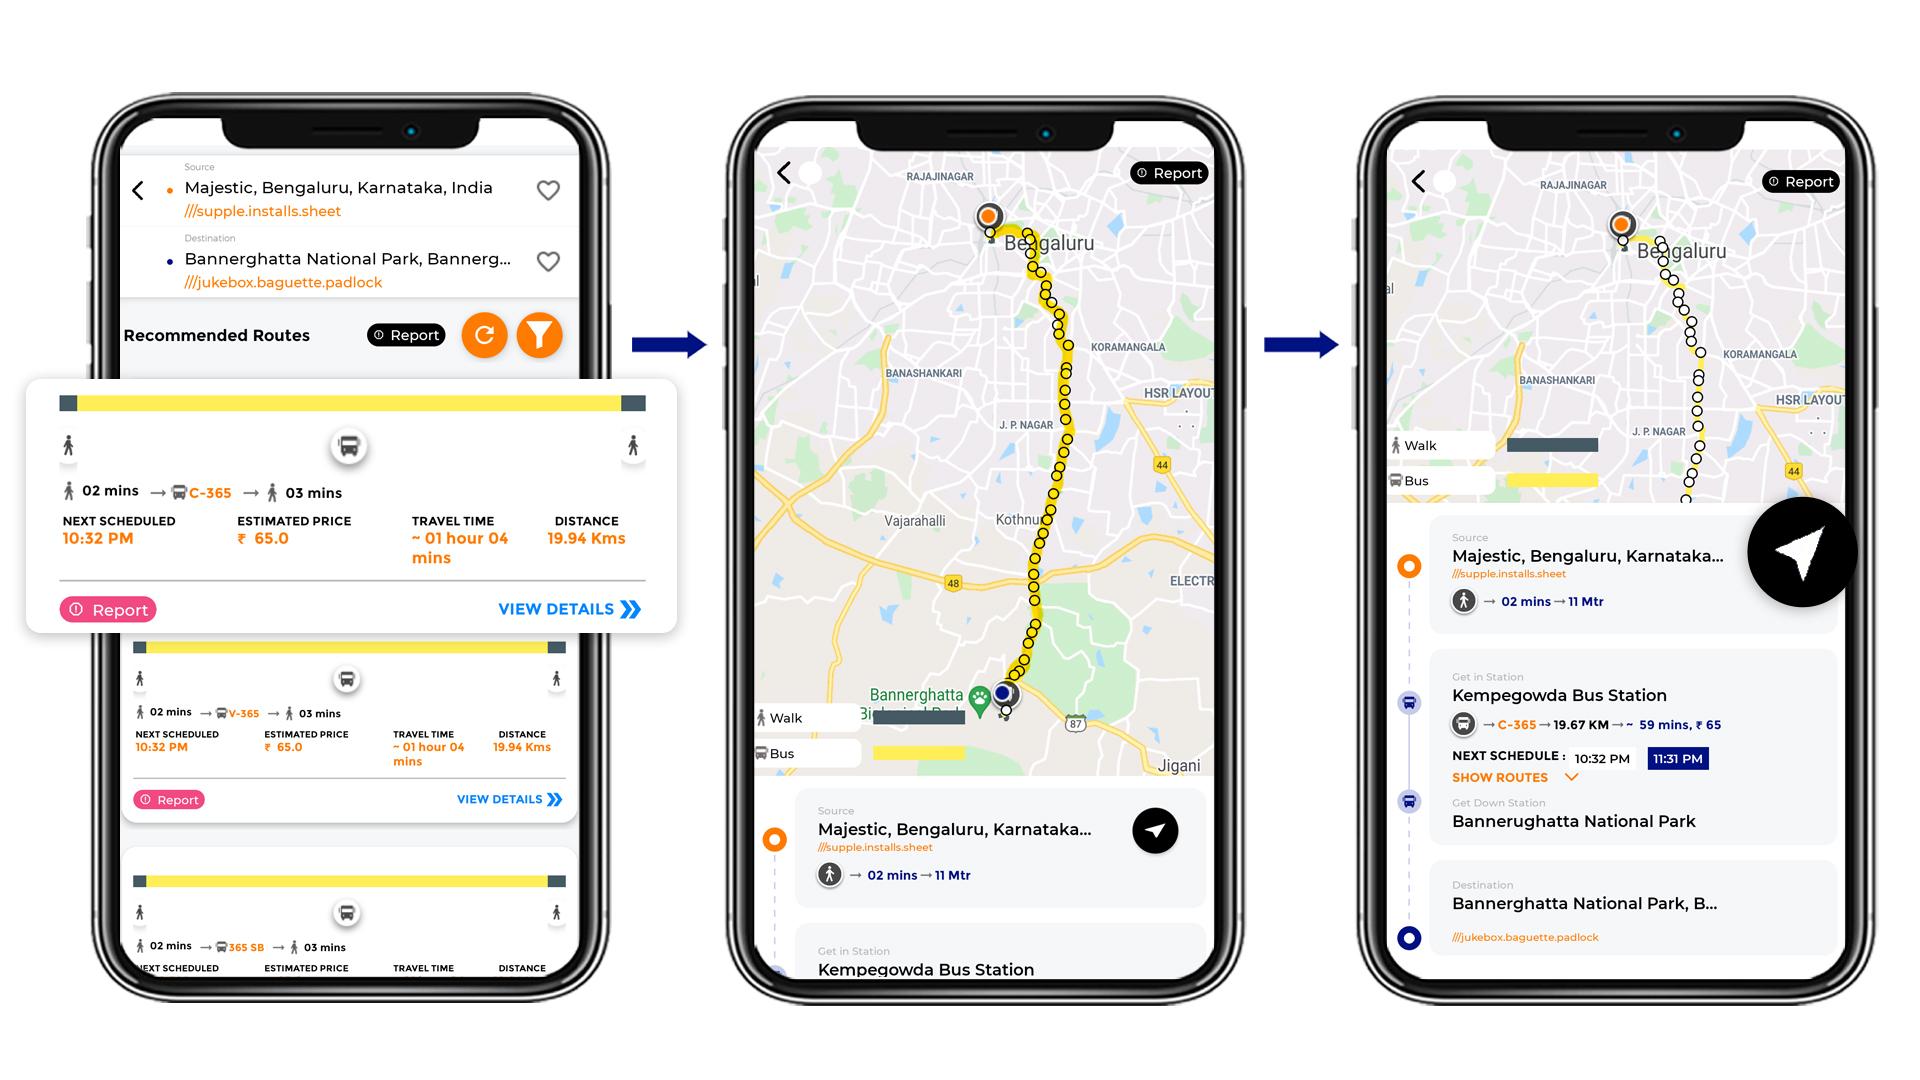 Tummoc, Tummoc app, Bannerghatta National Park, Public transport information, Majestic